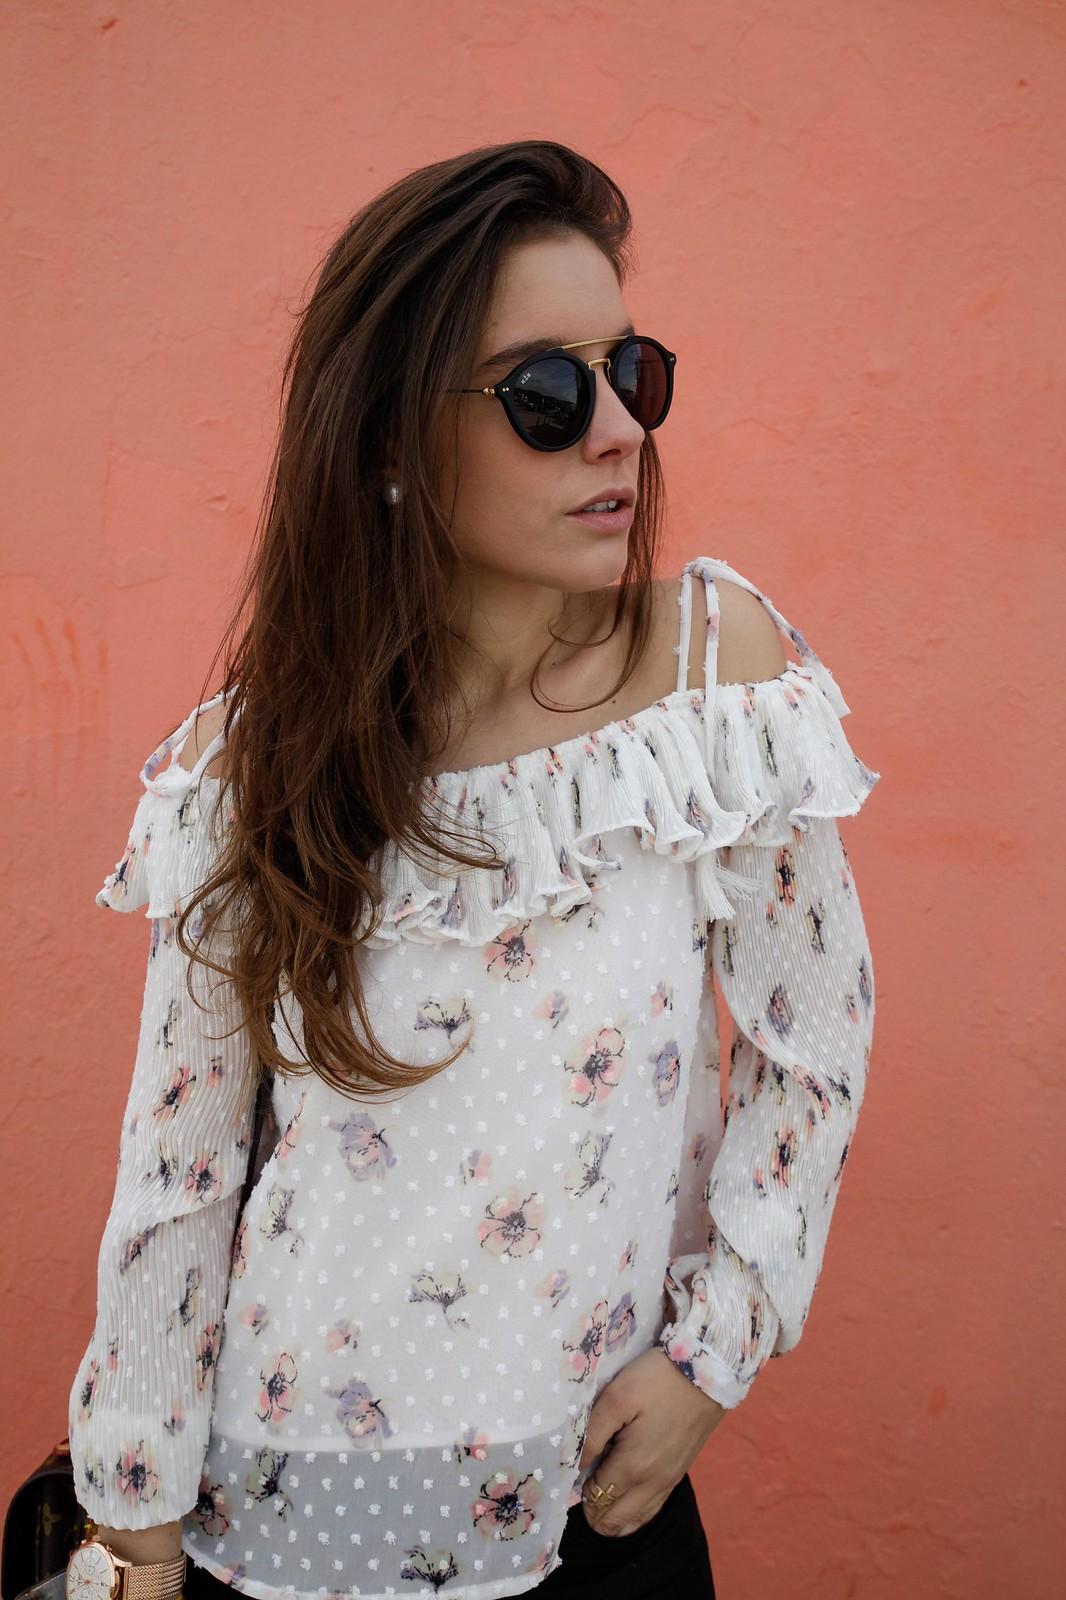 013_BLUSA_DE_FLORES_DEBY_DEBO_FASHION_BLOGGER_THEGUESTGIRL_BARCELONA_LAURA_SANTOLARIA_THE_GUEST_GIRL